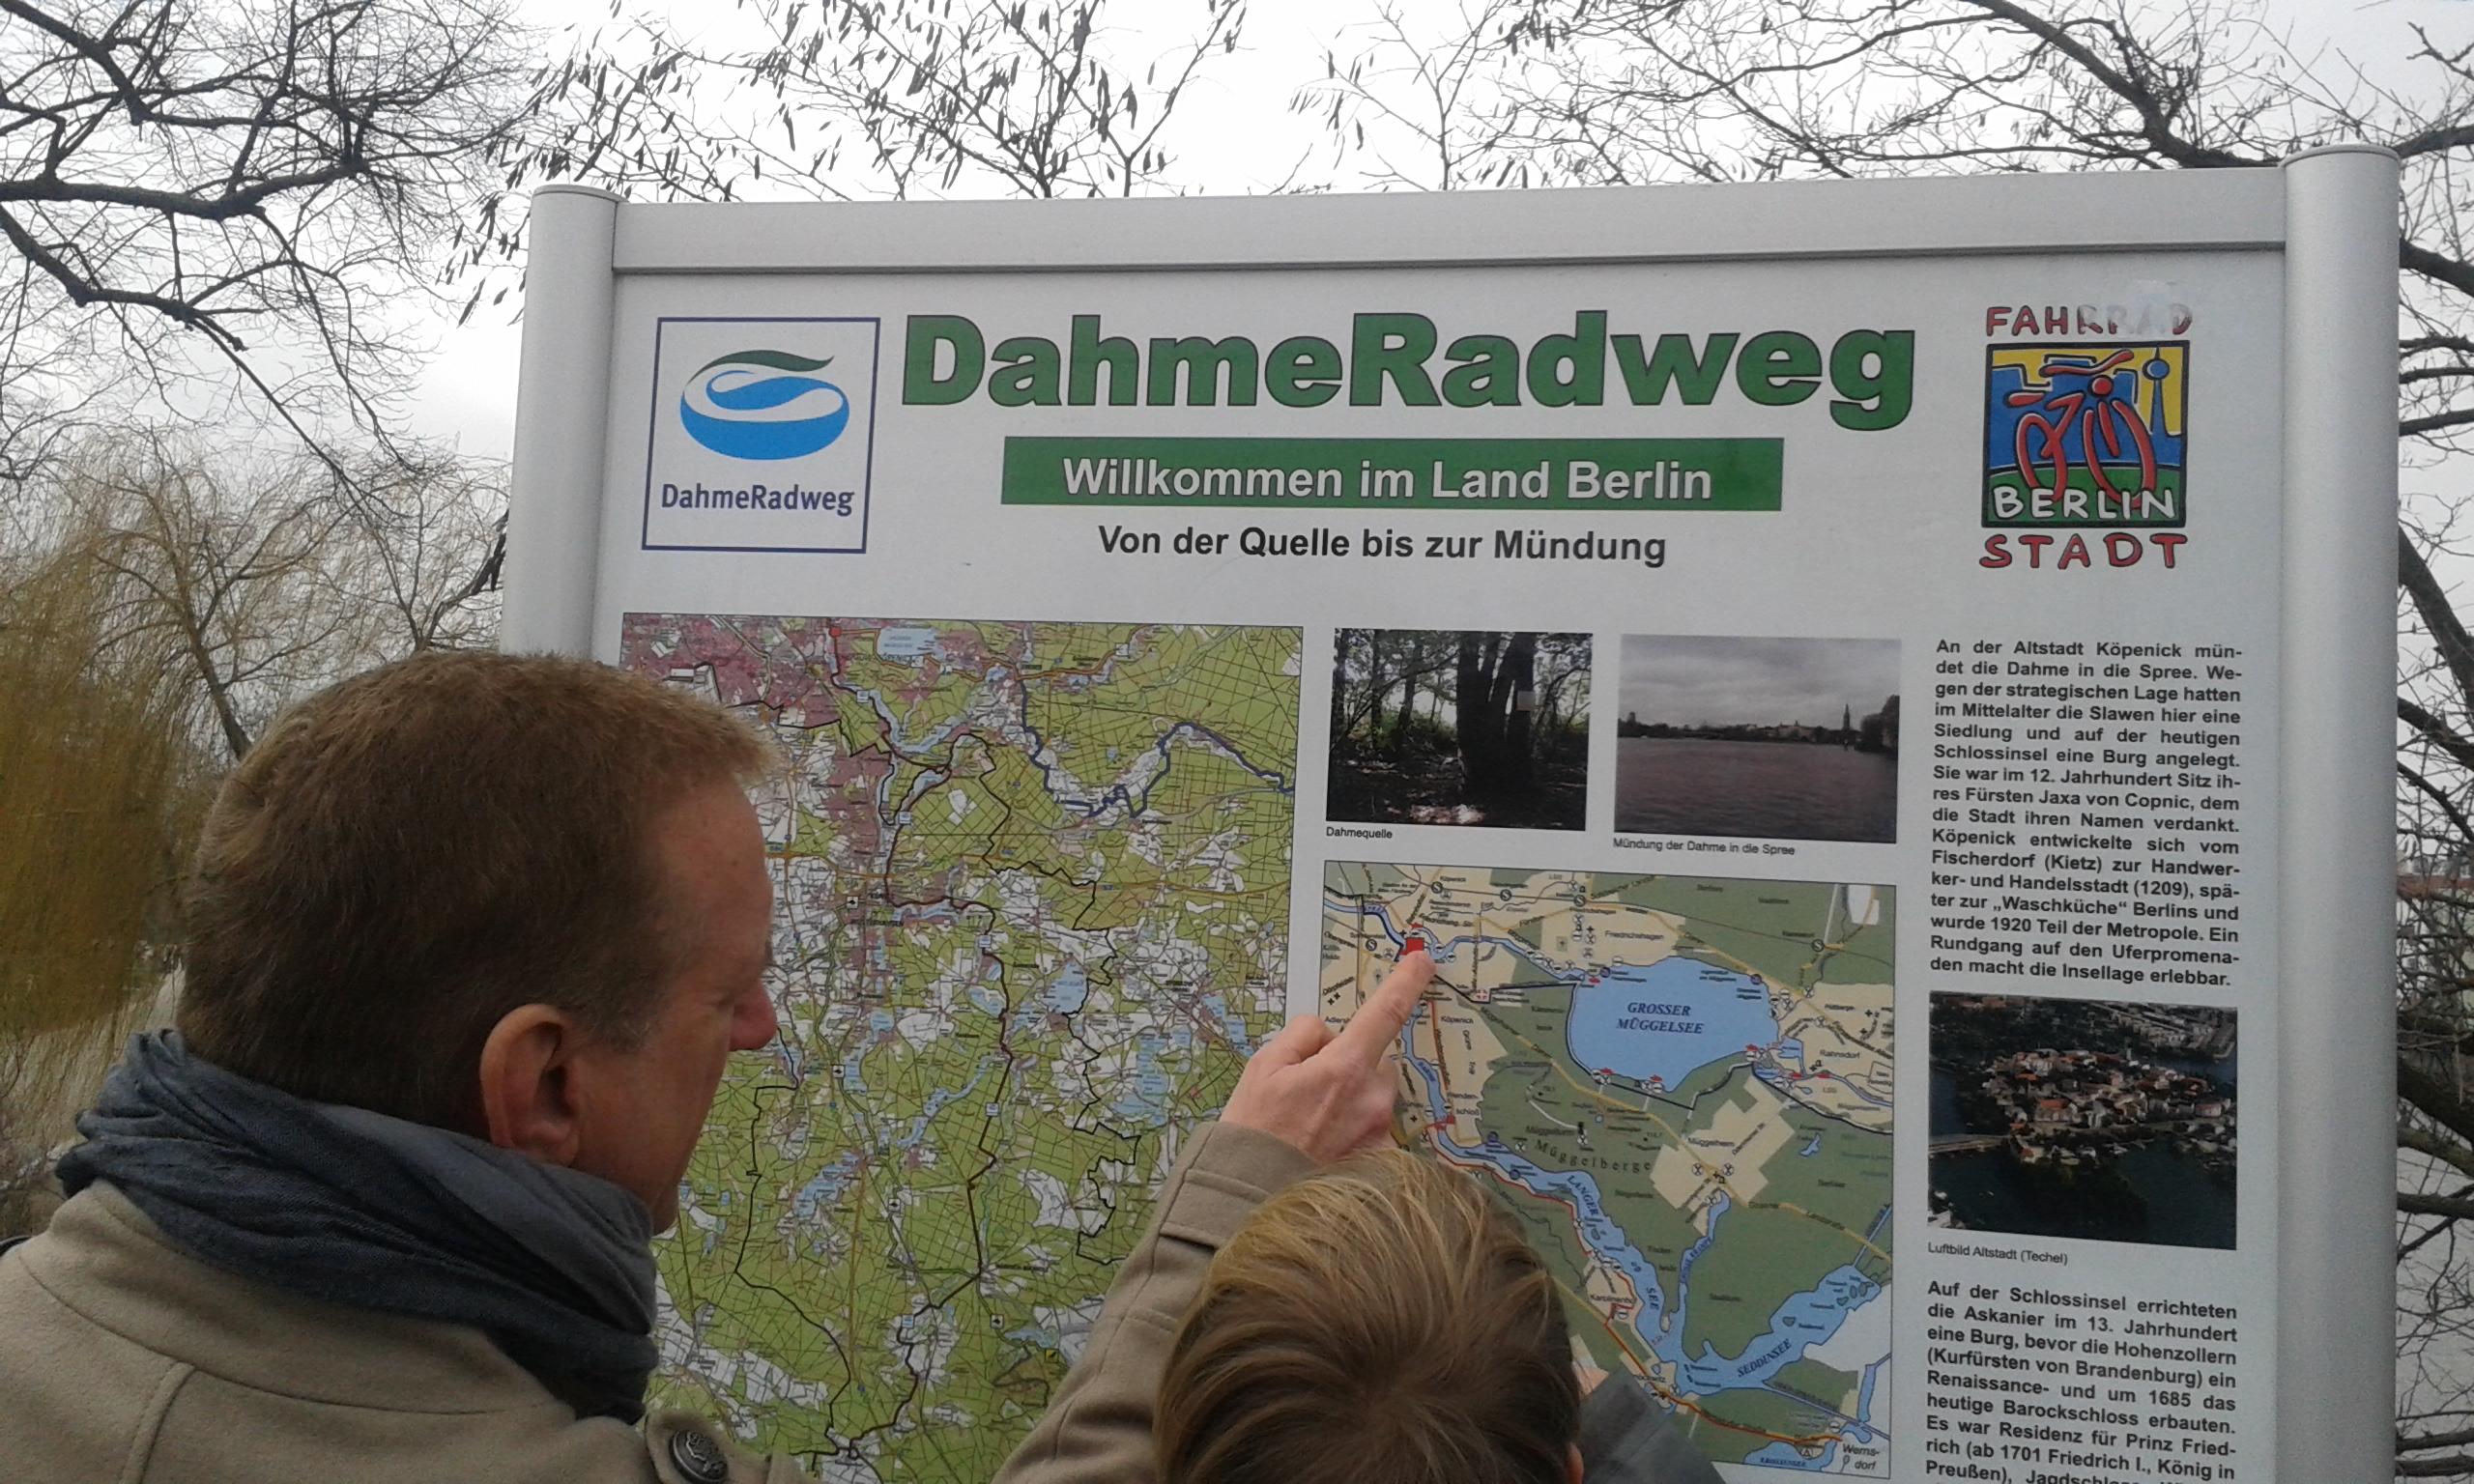 Dahmeradweg